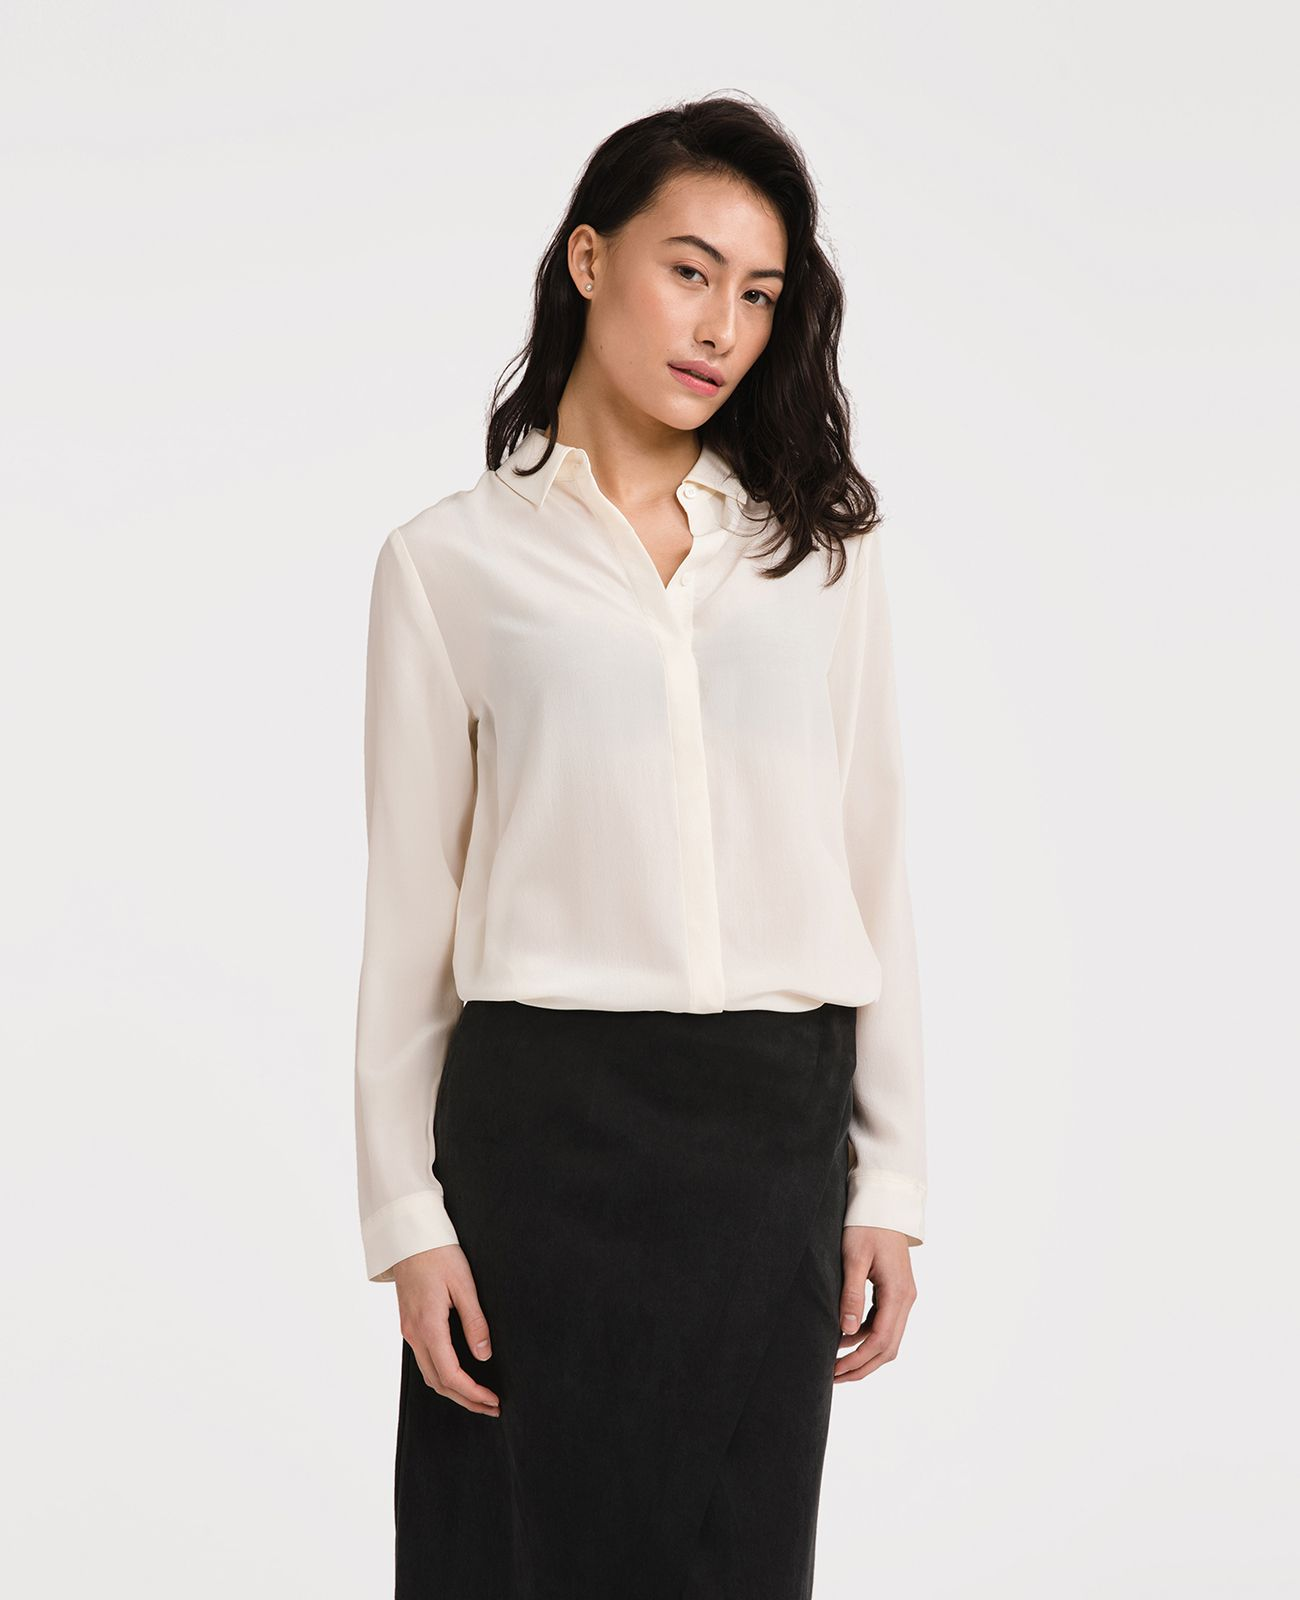 Grana - Chinese Silk Long Sleeve Shirt $89.00